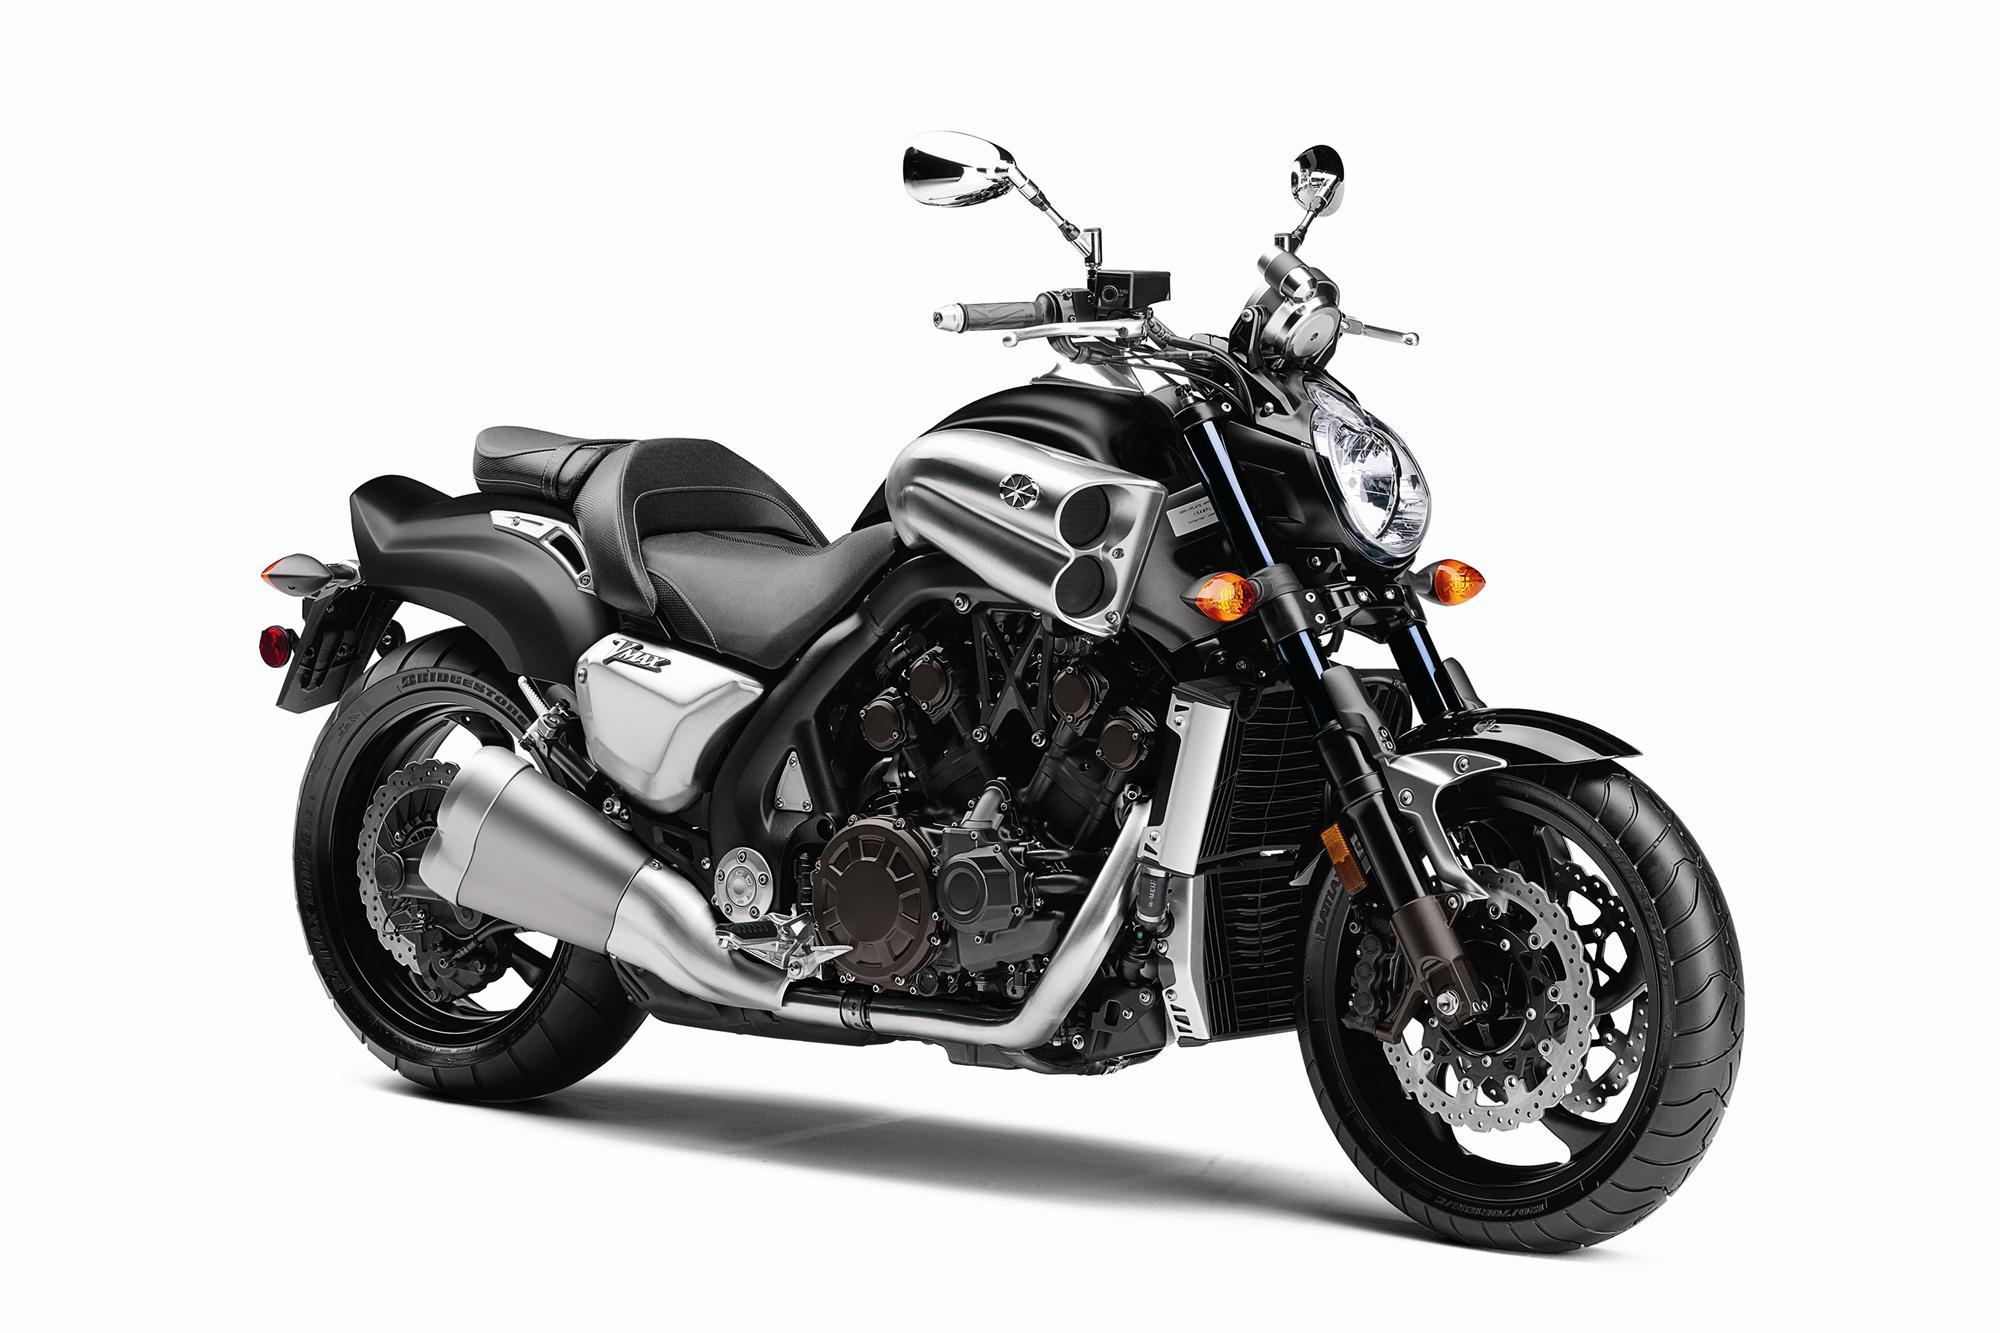 YAMAHA XJR1300 specs - 2008, 2009 (Görüntüler ile)   Motorsiklet